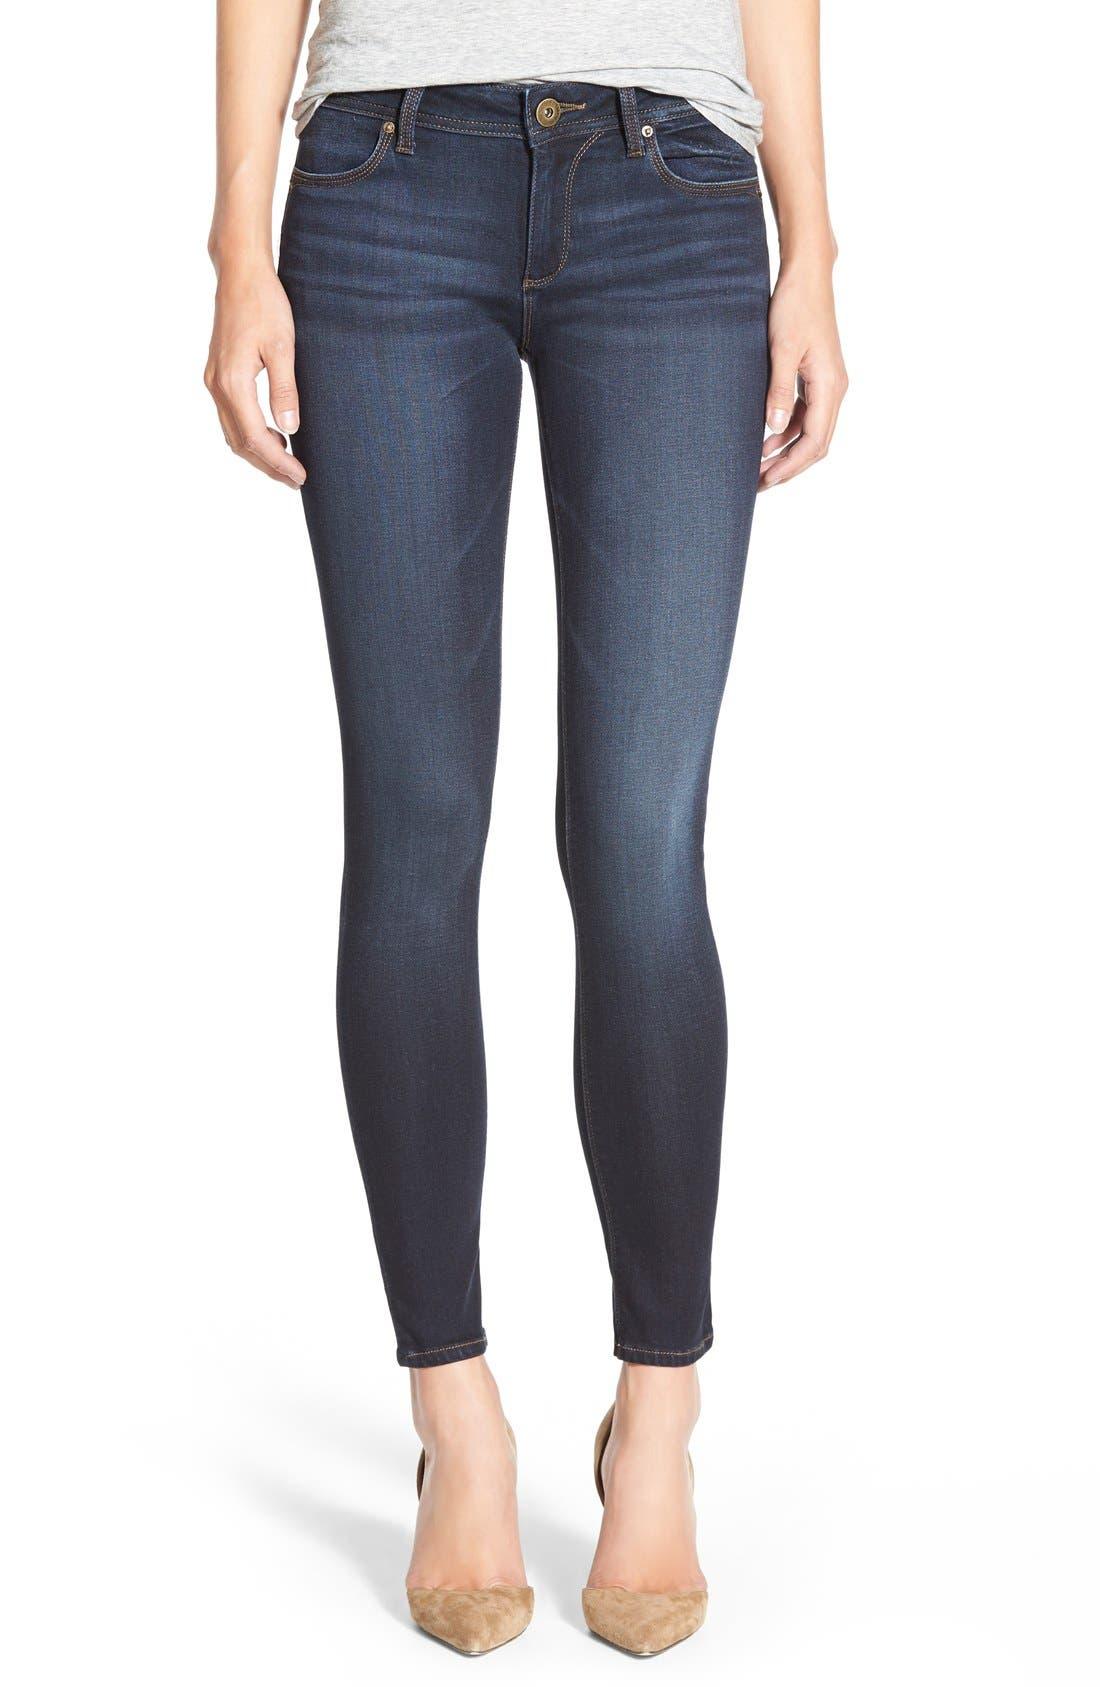 Main Image - DL1961 'Emma' Power Legging Jeans (Walton)